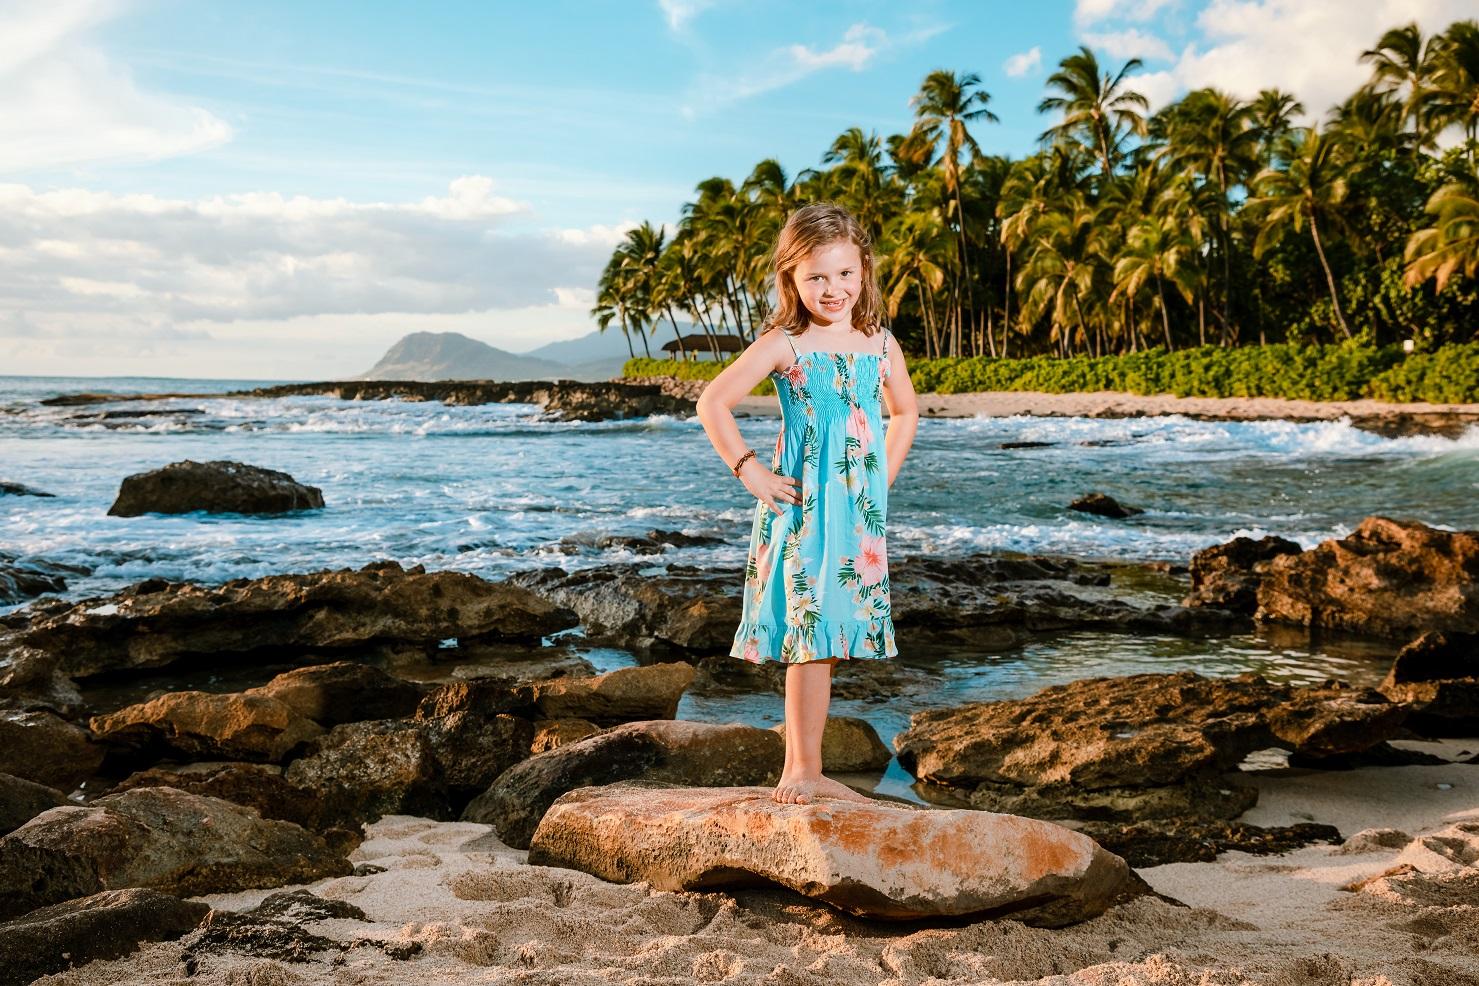 Oahu2018-48538.jpg